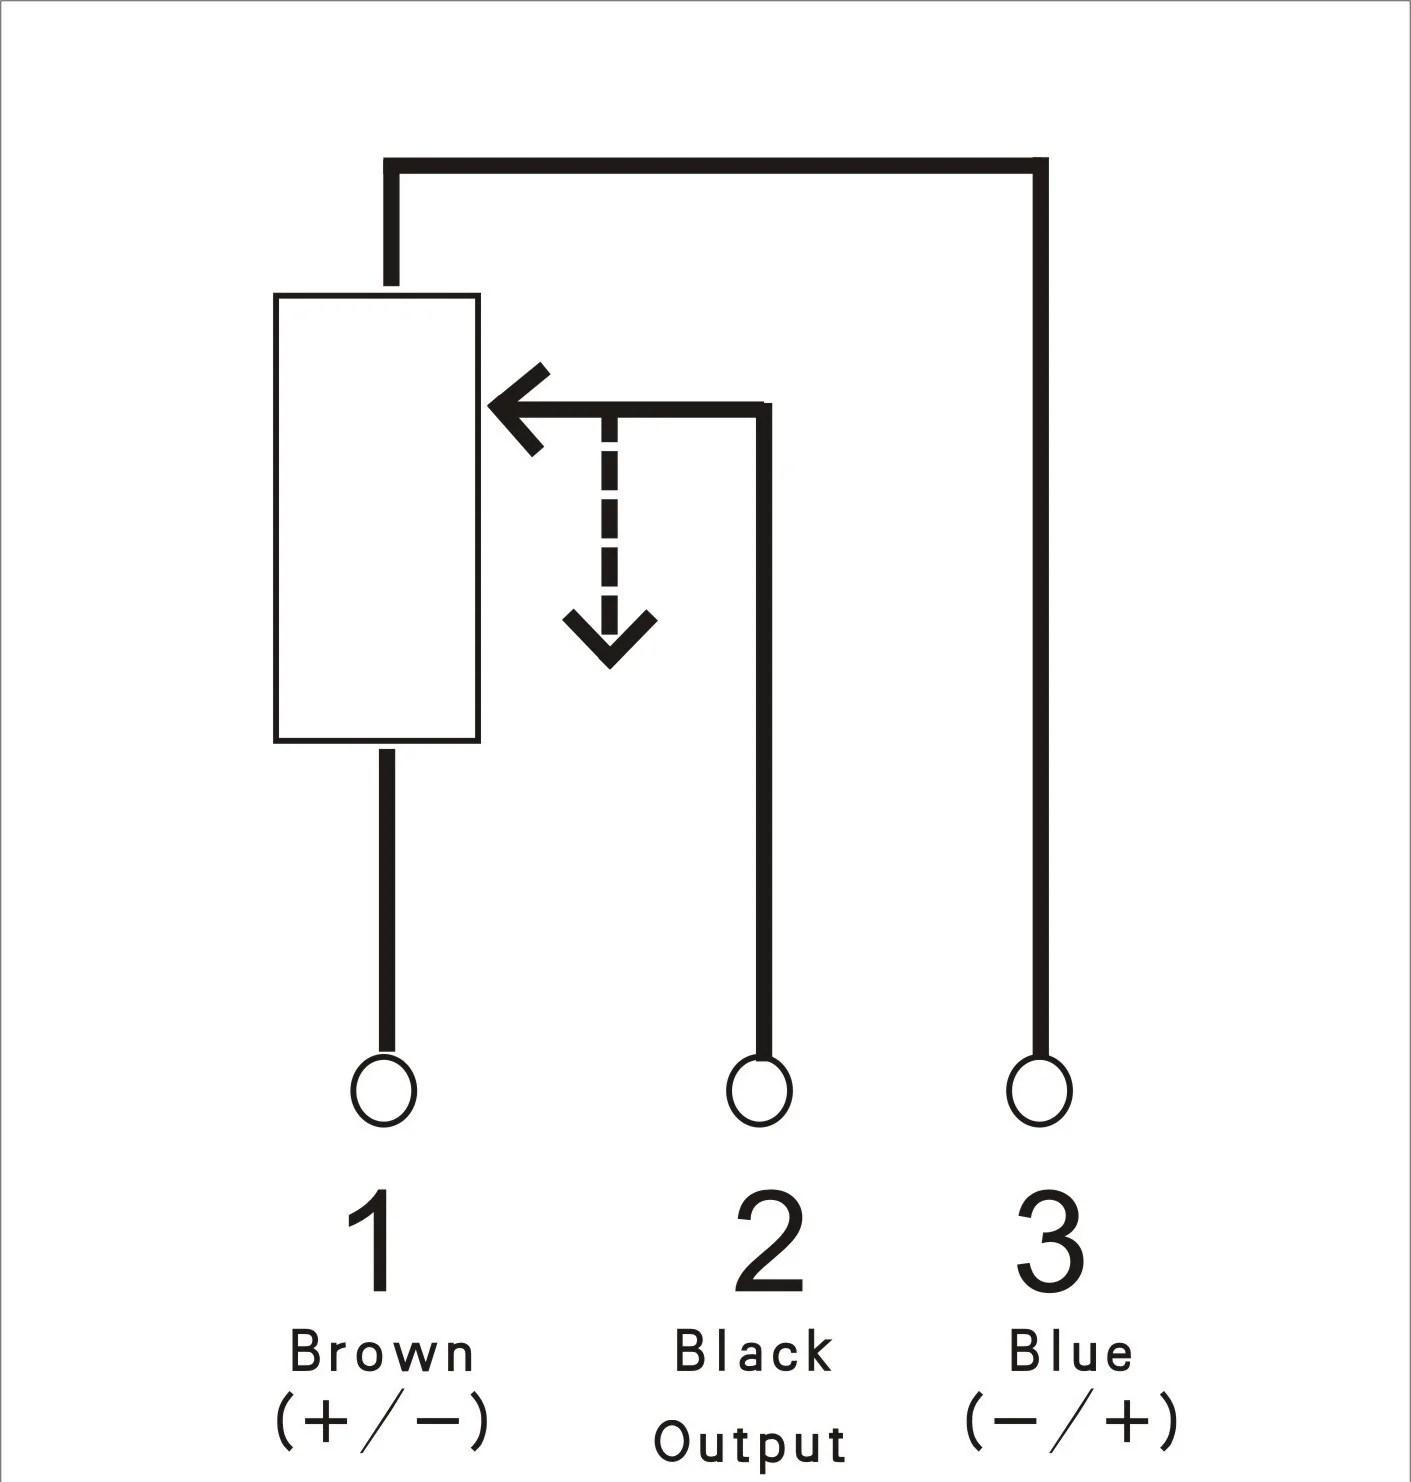 small resolution of potentiometer wiring diagram wiring diagrams lol for a 10k potentiometer wiring diagrams little wiring diagrams joystick